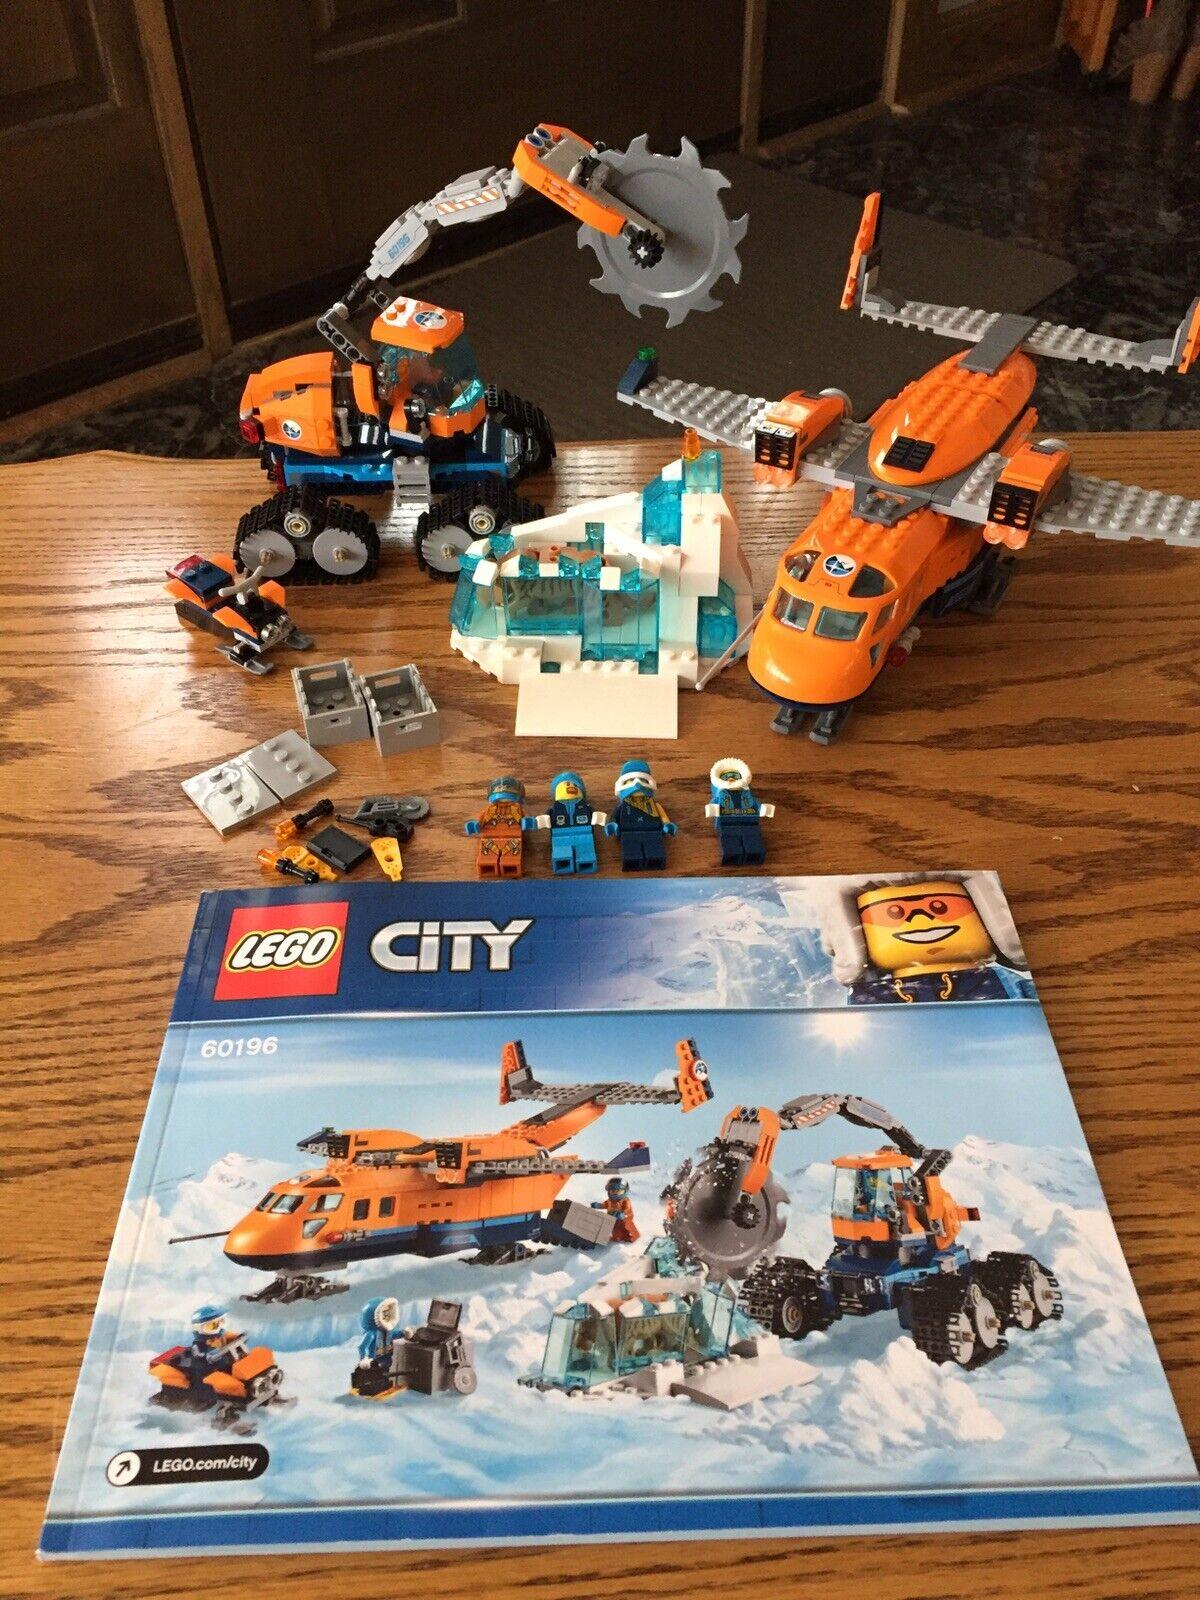 Lego City 60196 Arctic Supply Plane Sabertooth Tiger eskimos explorer 100% w box